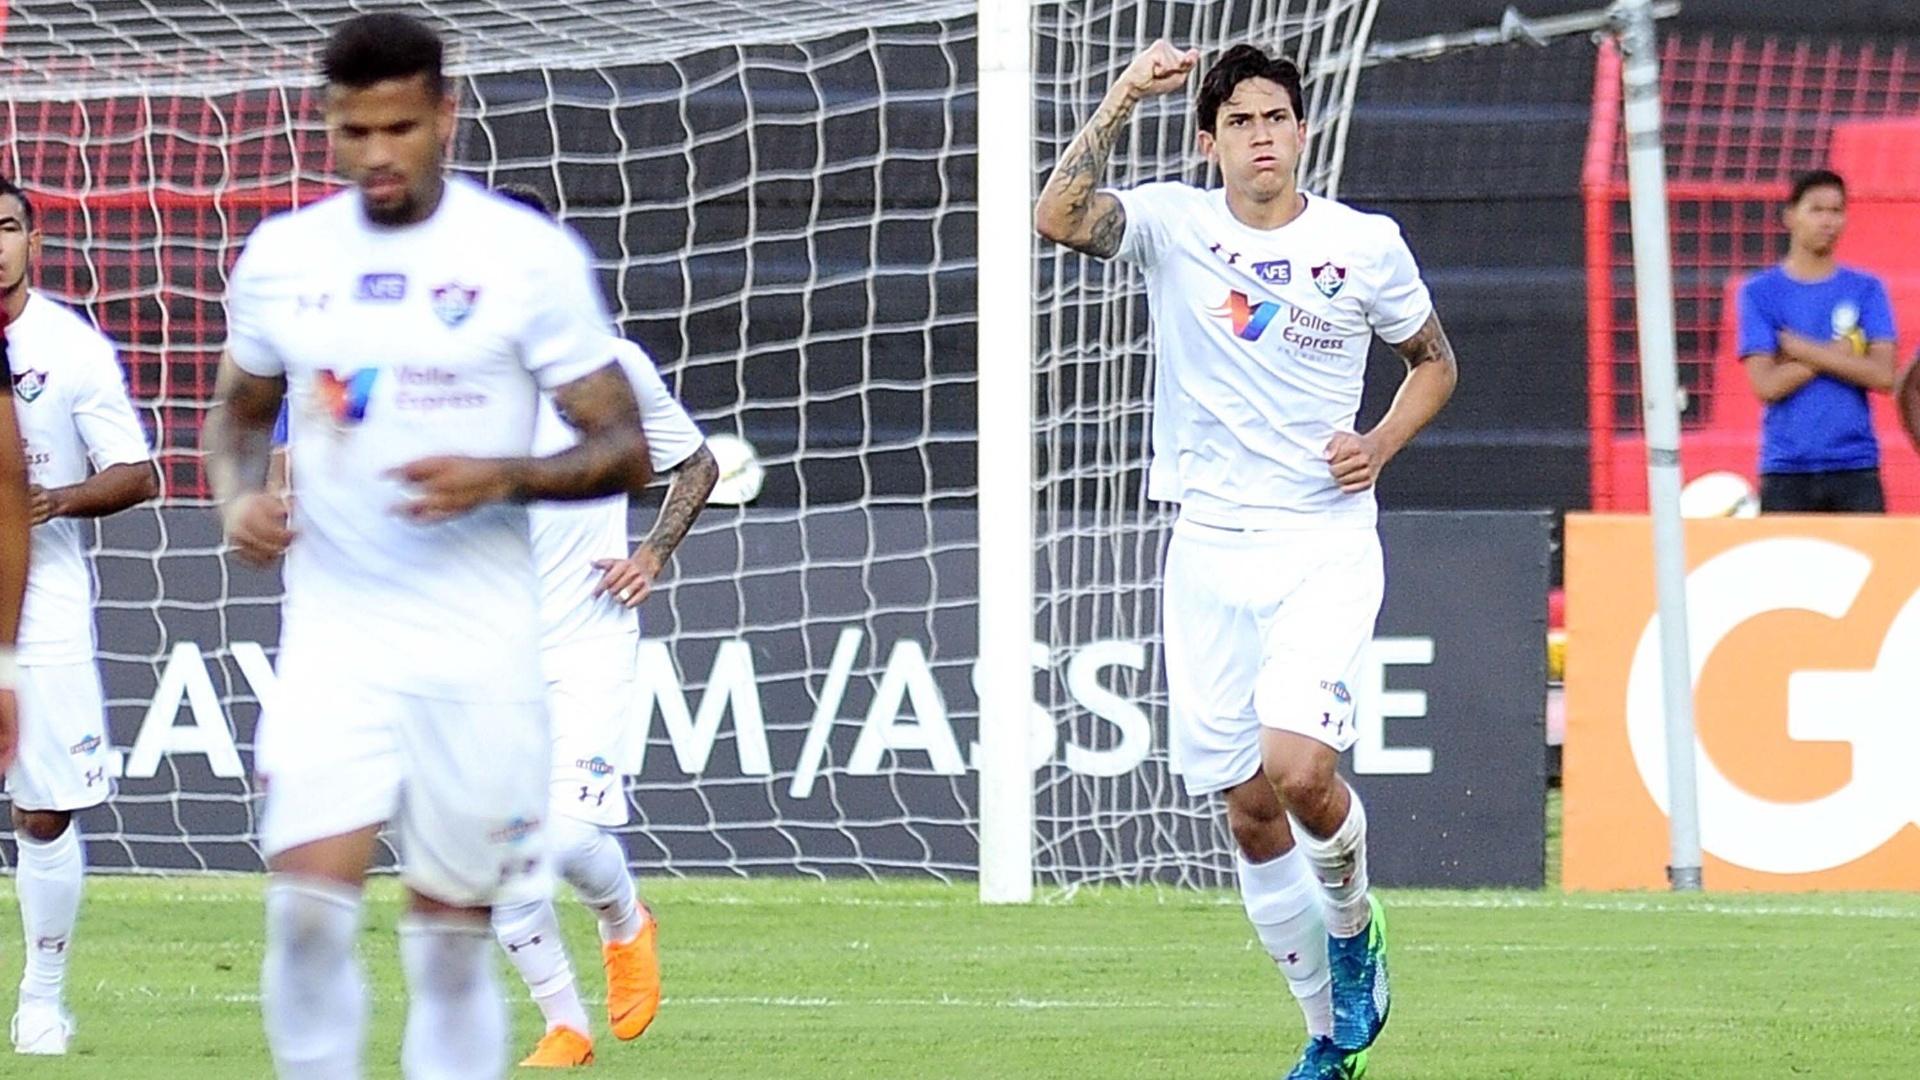 Pedro comemora gol marcado pelo Fluminense contra o Sport, pelo Campeonato Brasileiro